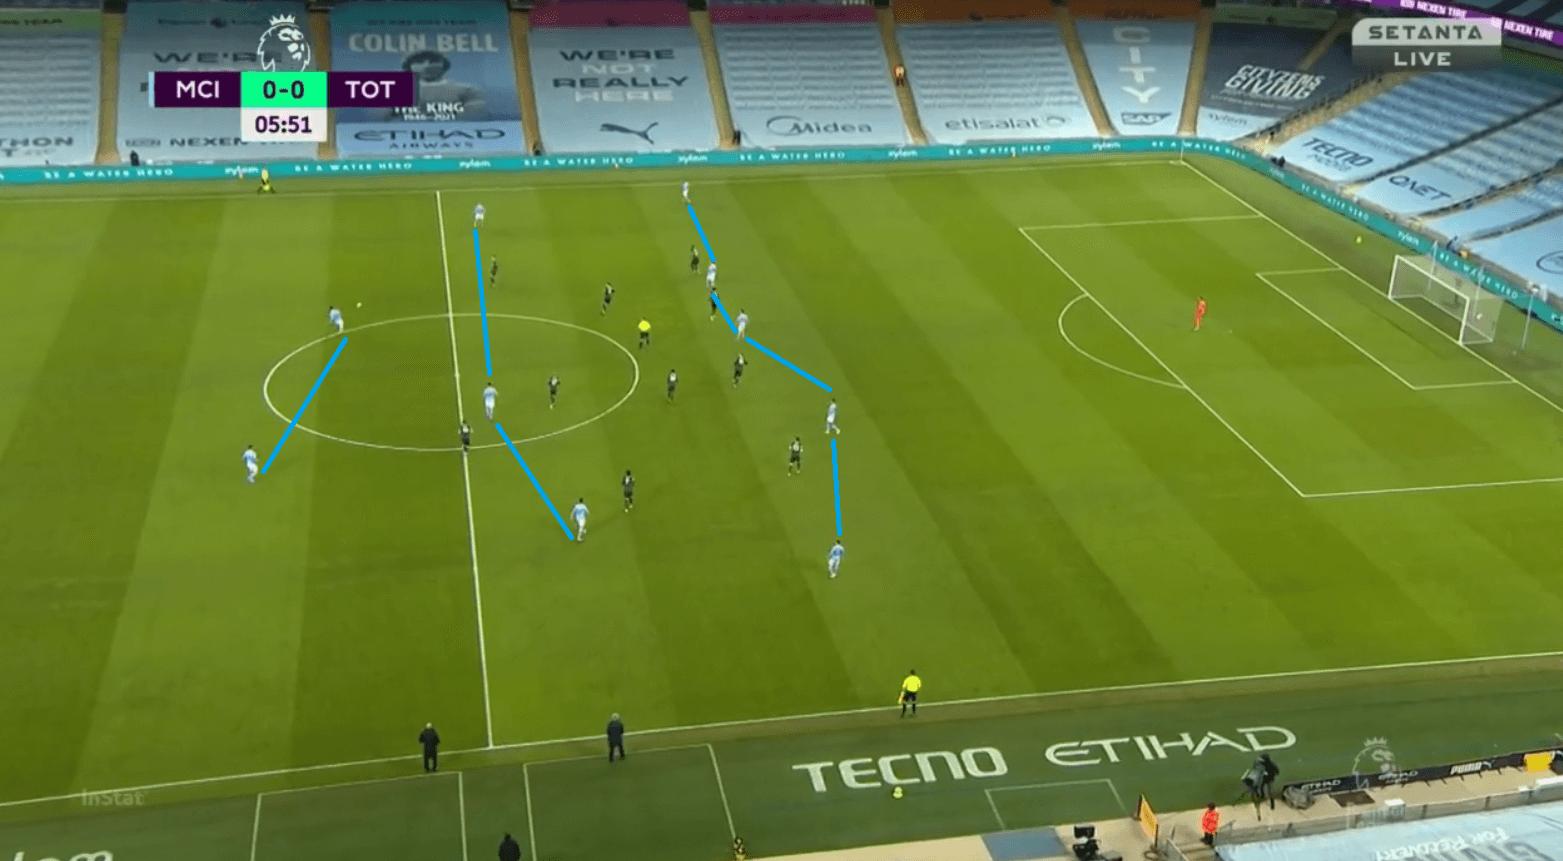 Gundogan S Goals How City Blindsided Tottenham In Their 3 0 Victory